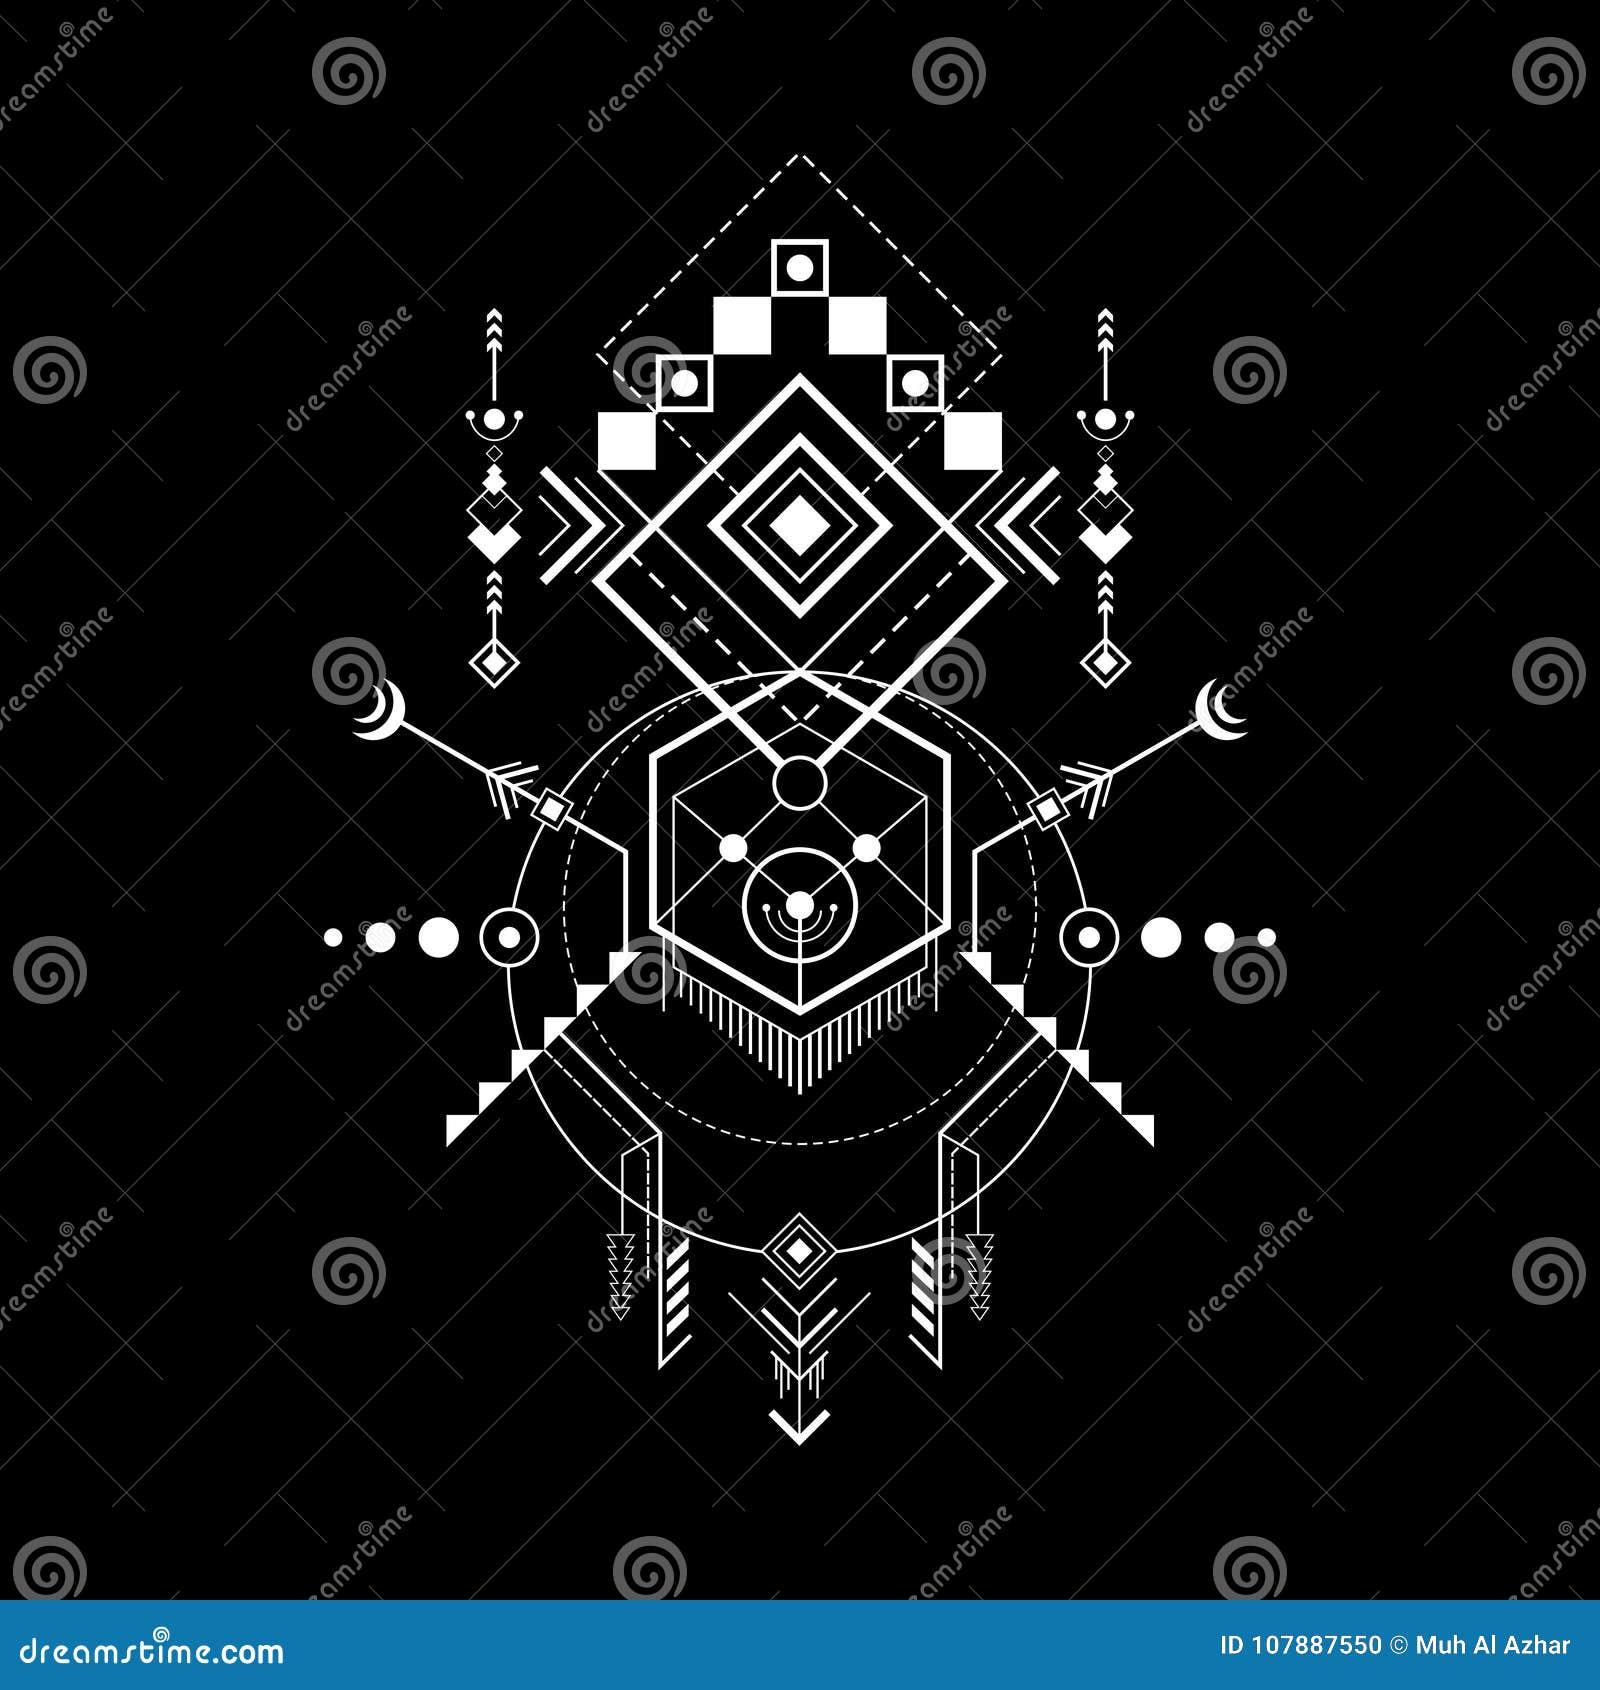 sacred geometry navajo art stock vector illustration of abstract